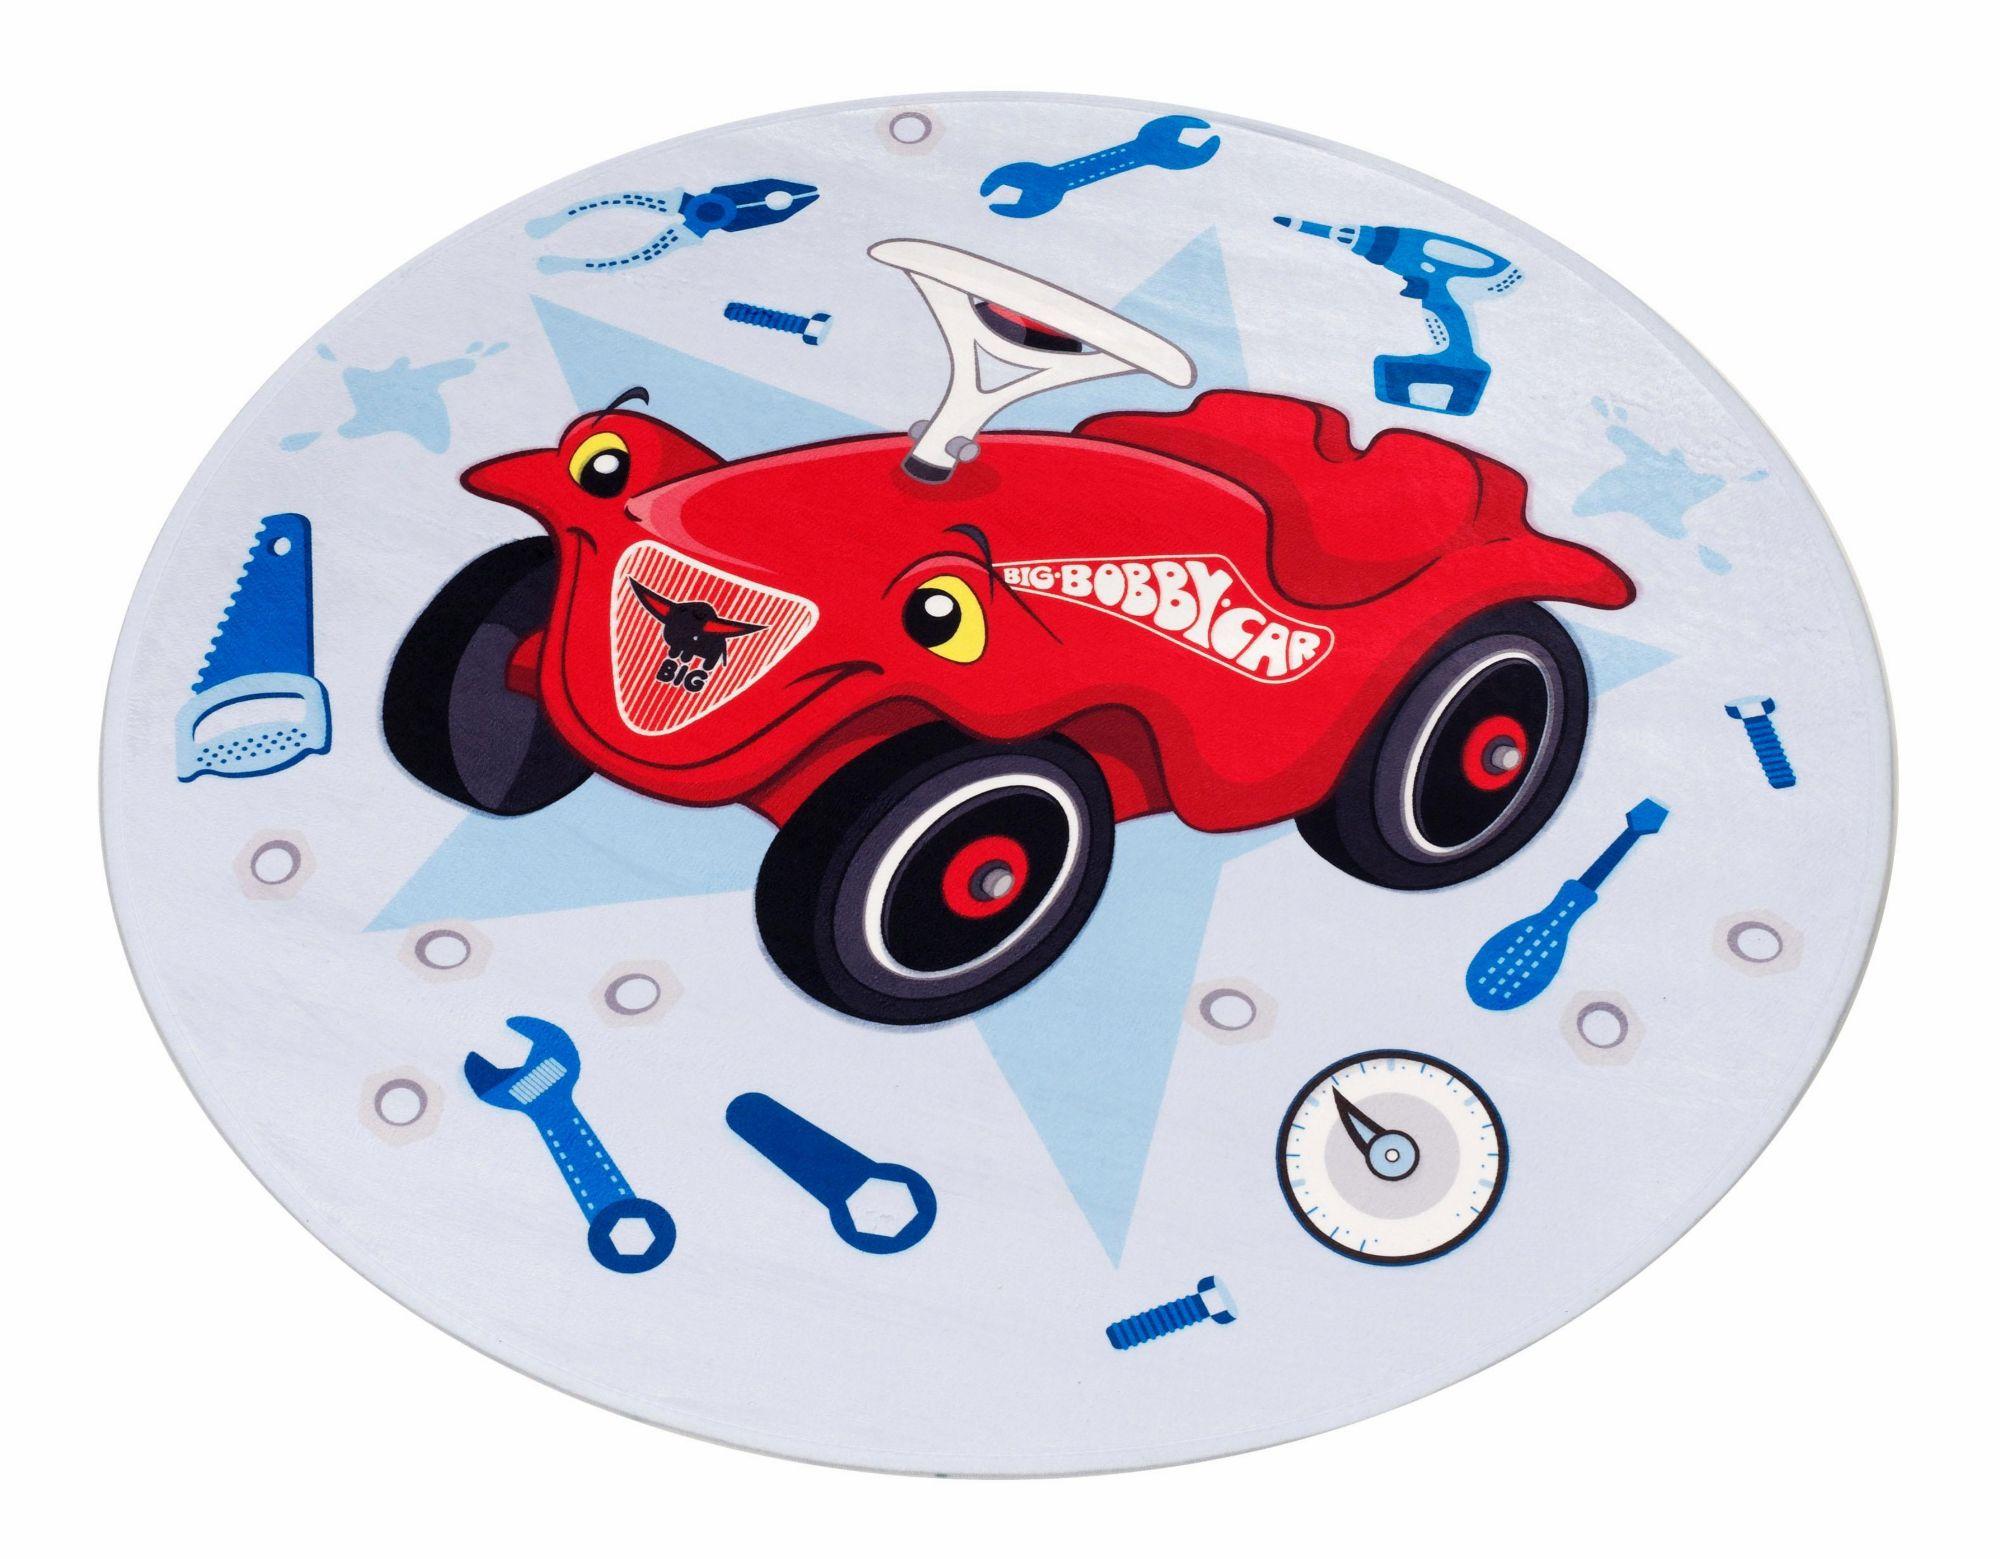 BOBBY CAR Kinderteppich, »Bobby Car 102«, Bobby Car, rund, Höhe 6 mm, gedruckt